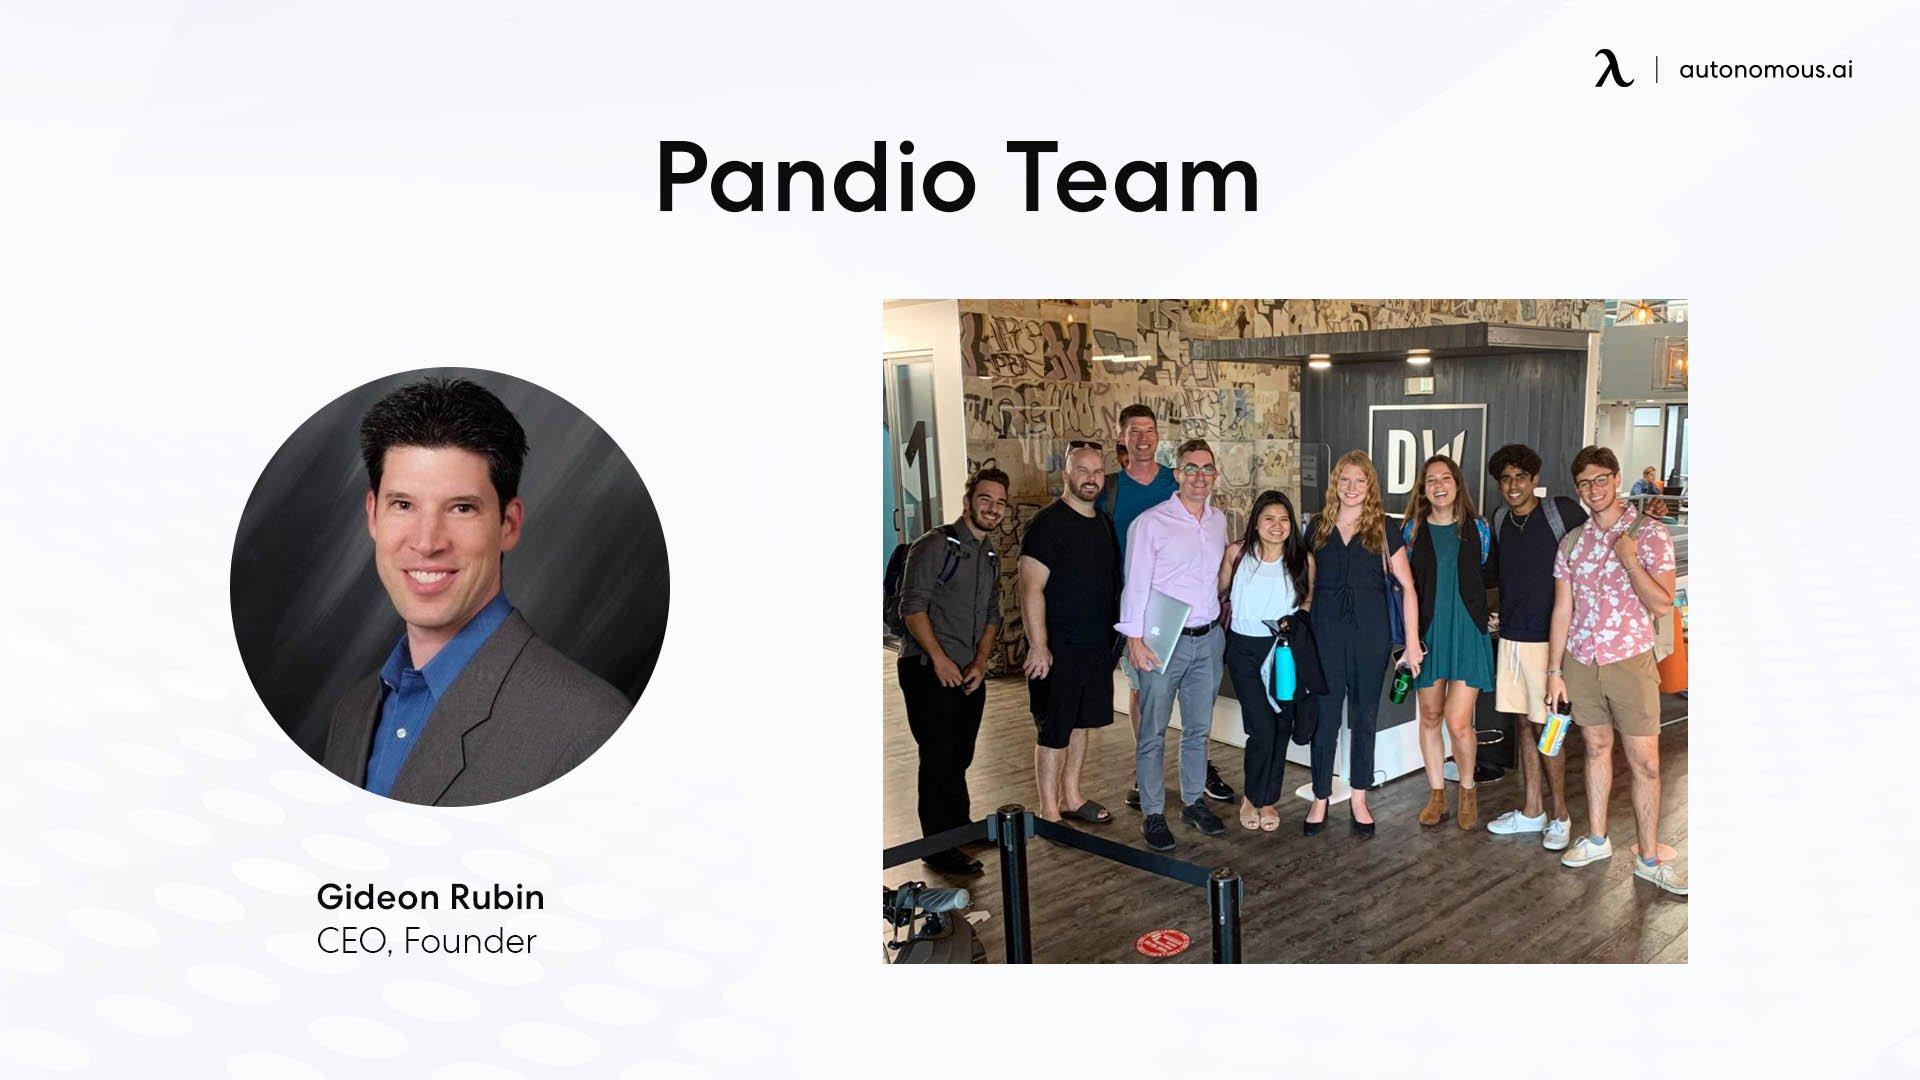 Pandio team